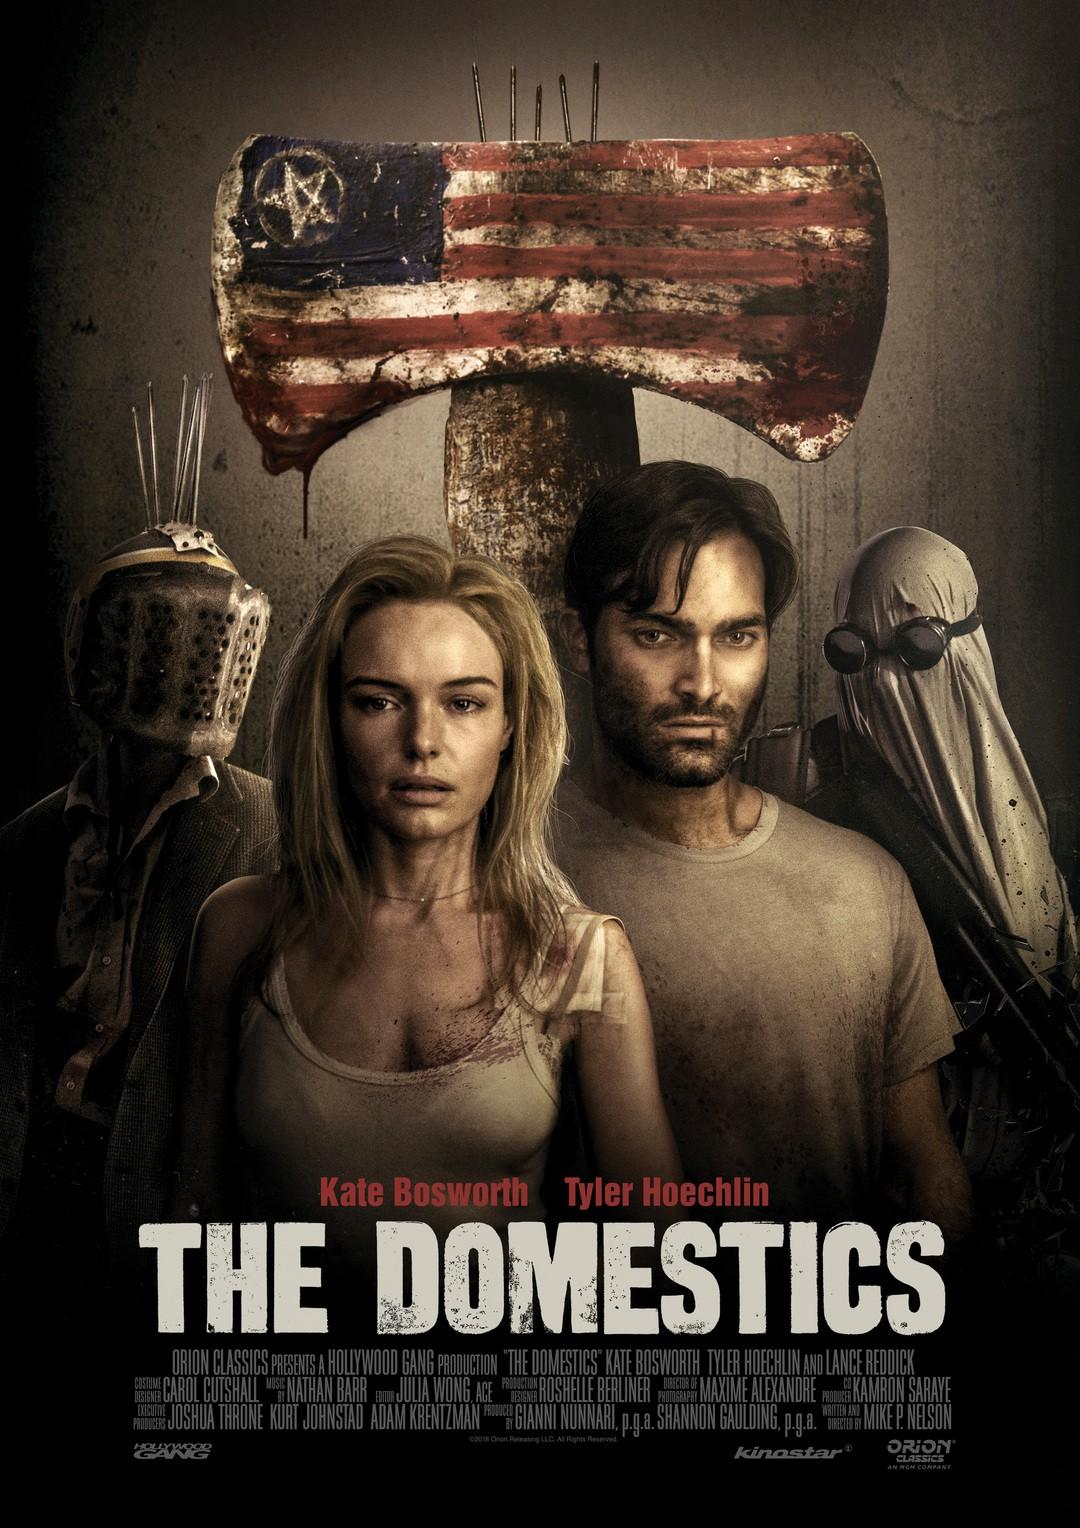 The Domestics - Bild 1 von 11